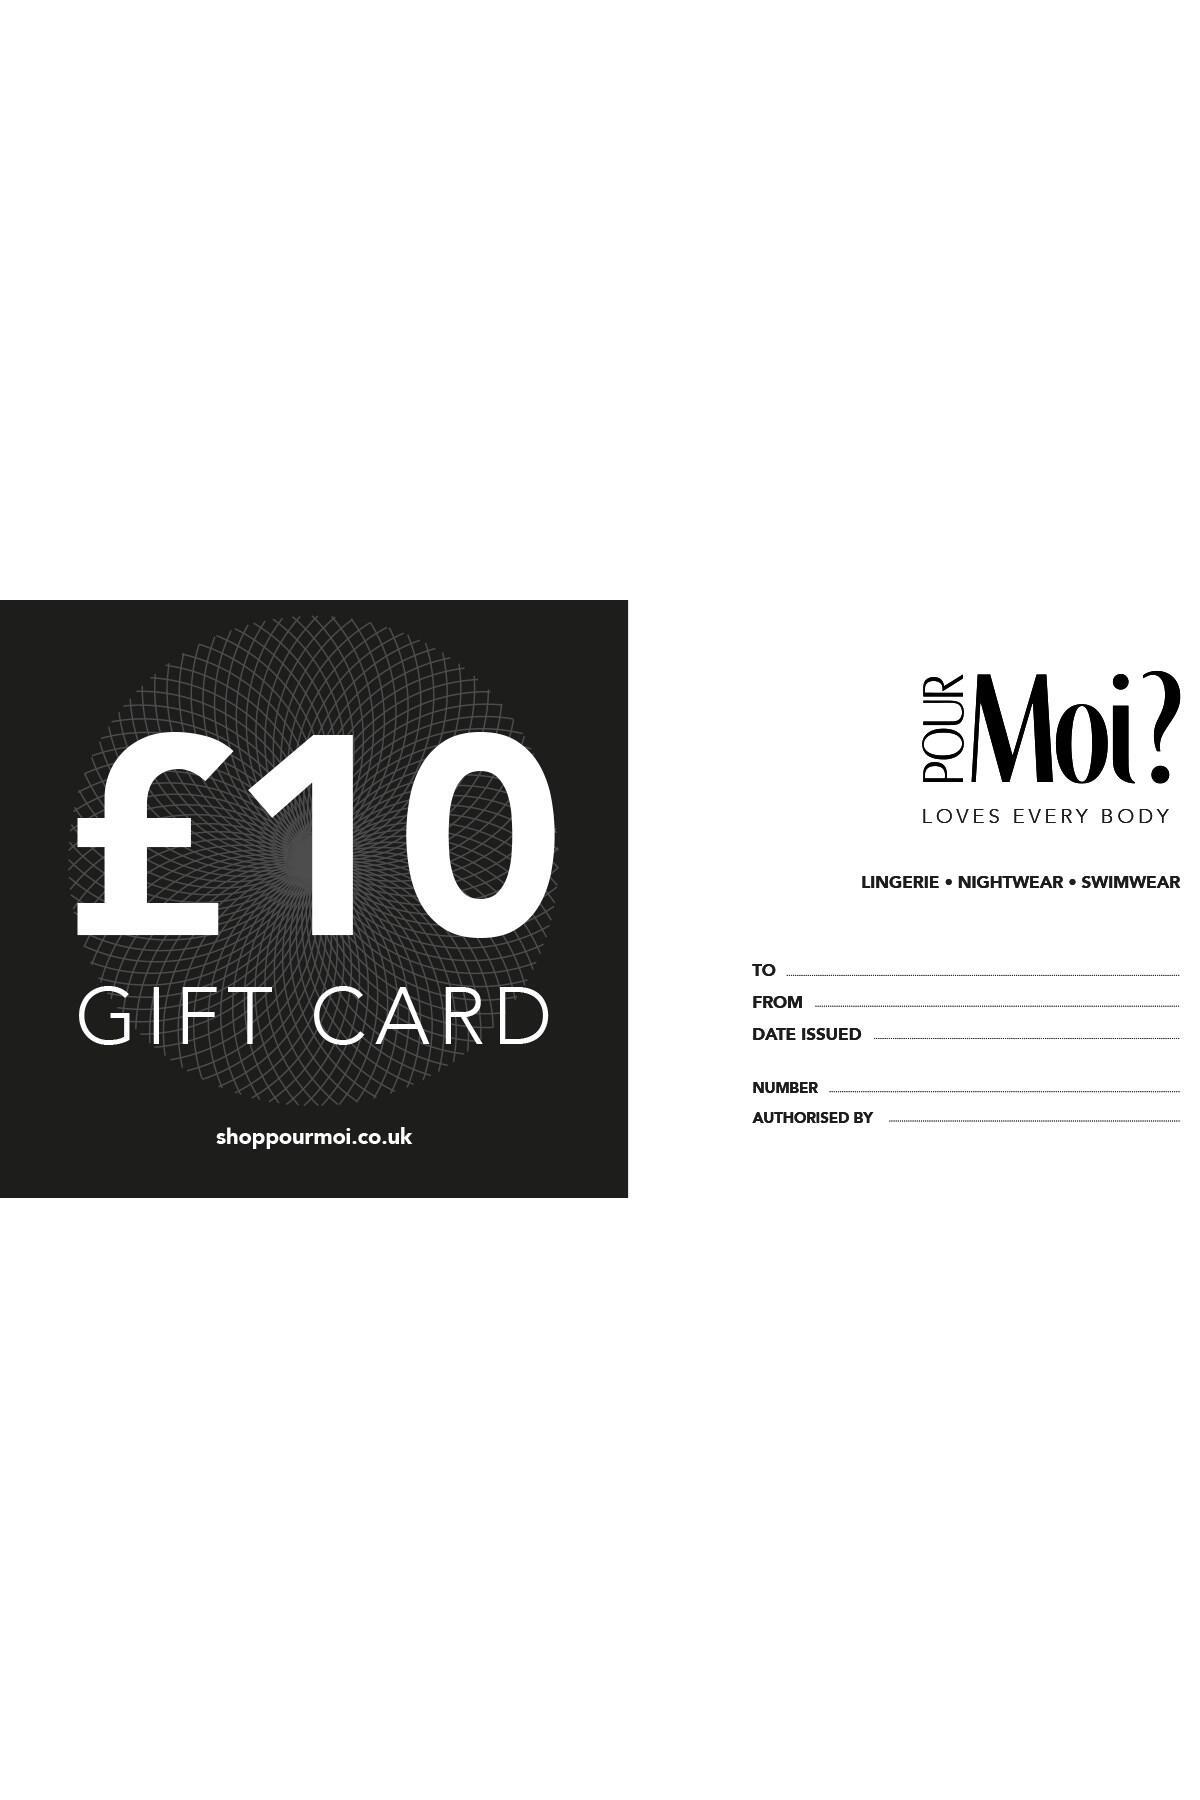 Gift Vouchers - £10